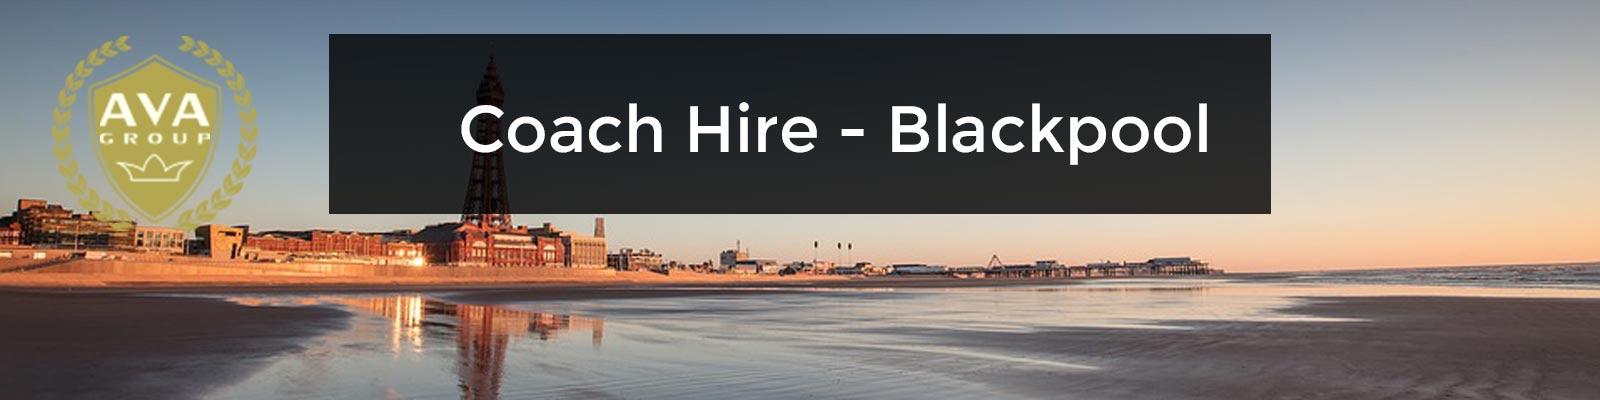 coach hire blackpool